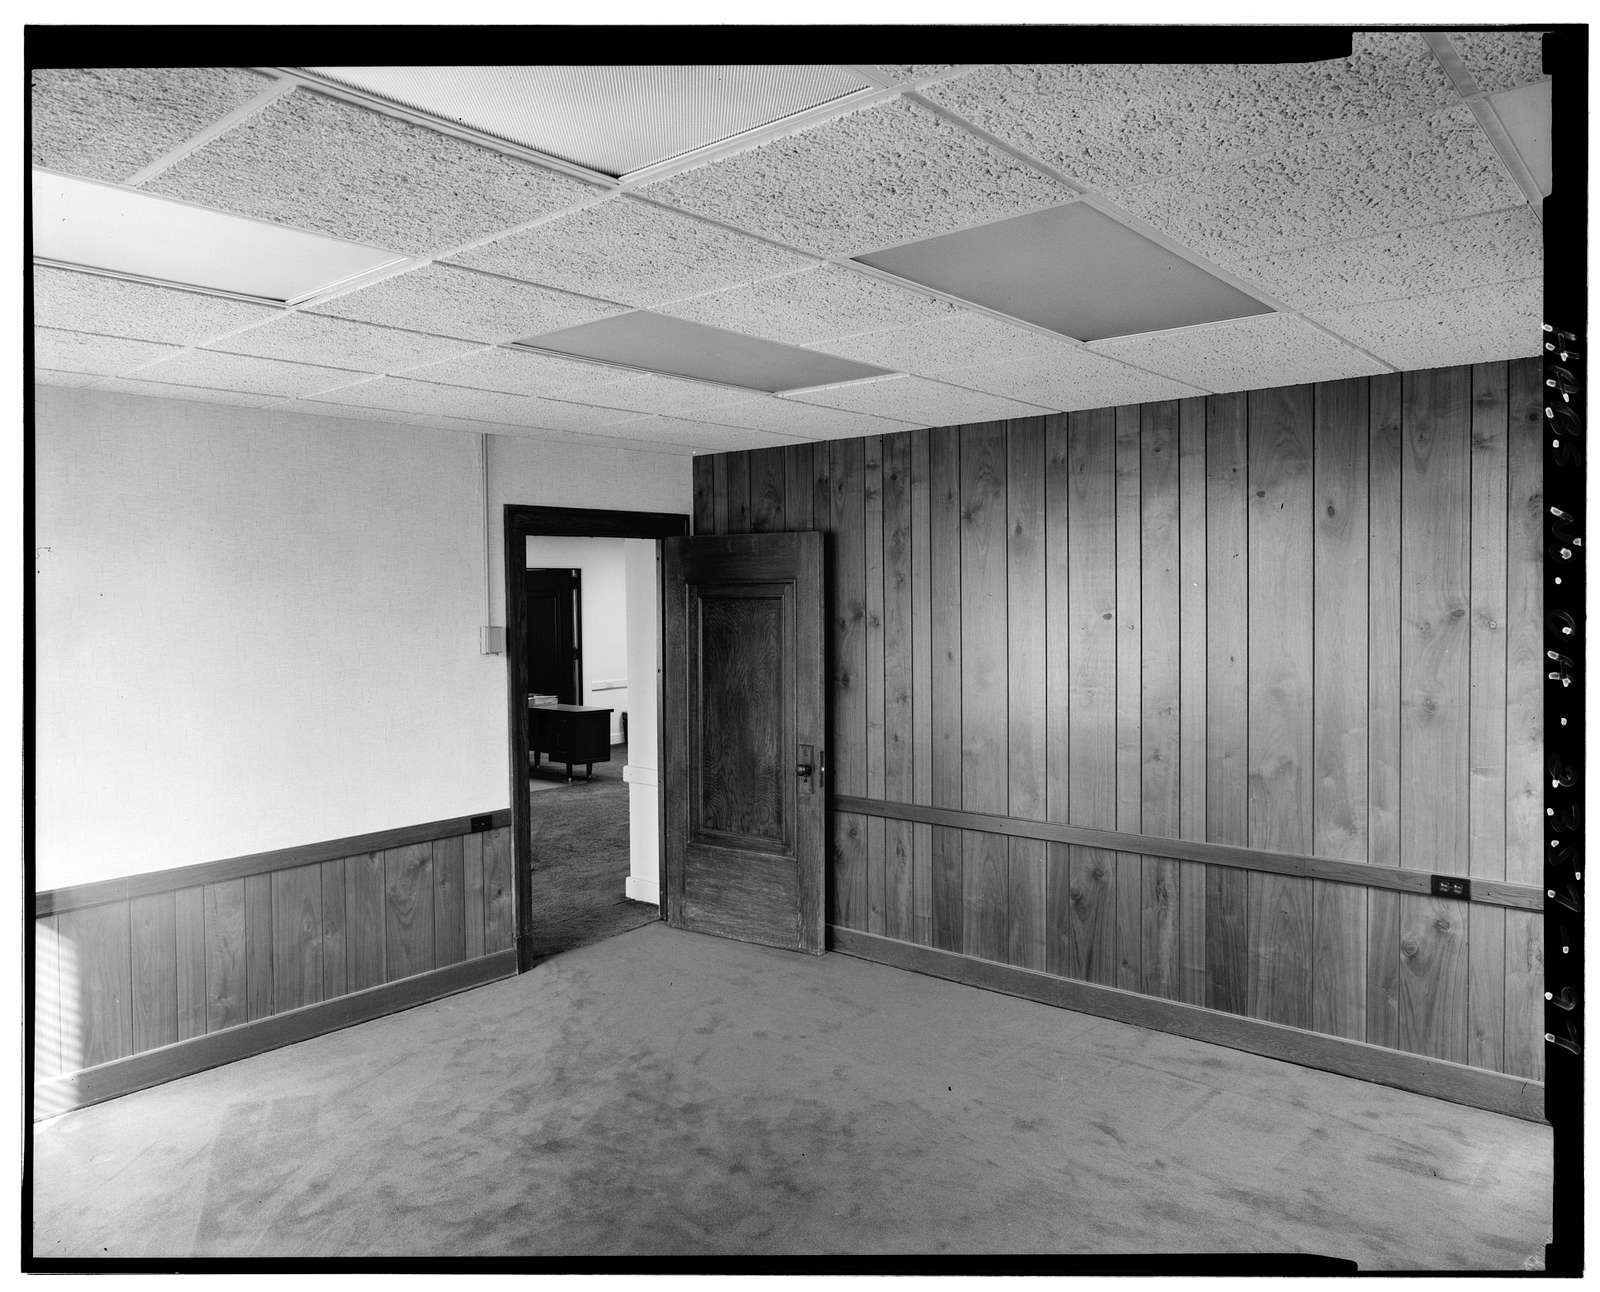 Brotherhood of Locomotive Engineers Building, 1365 Ontario Street, Cleveland, Cuyahoga County, OH